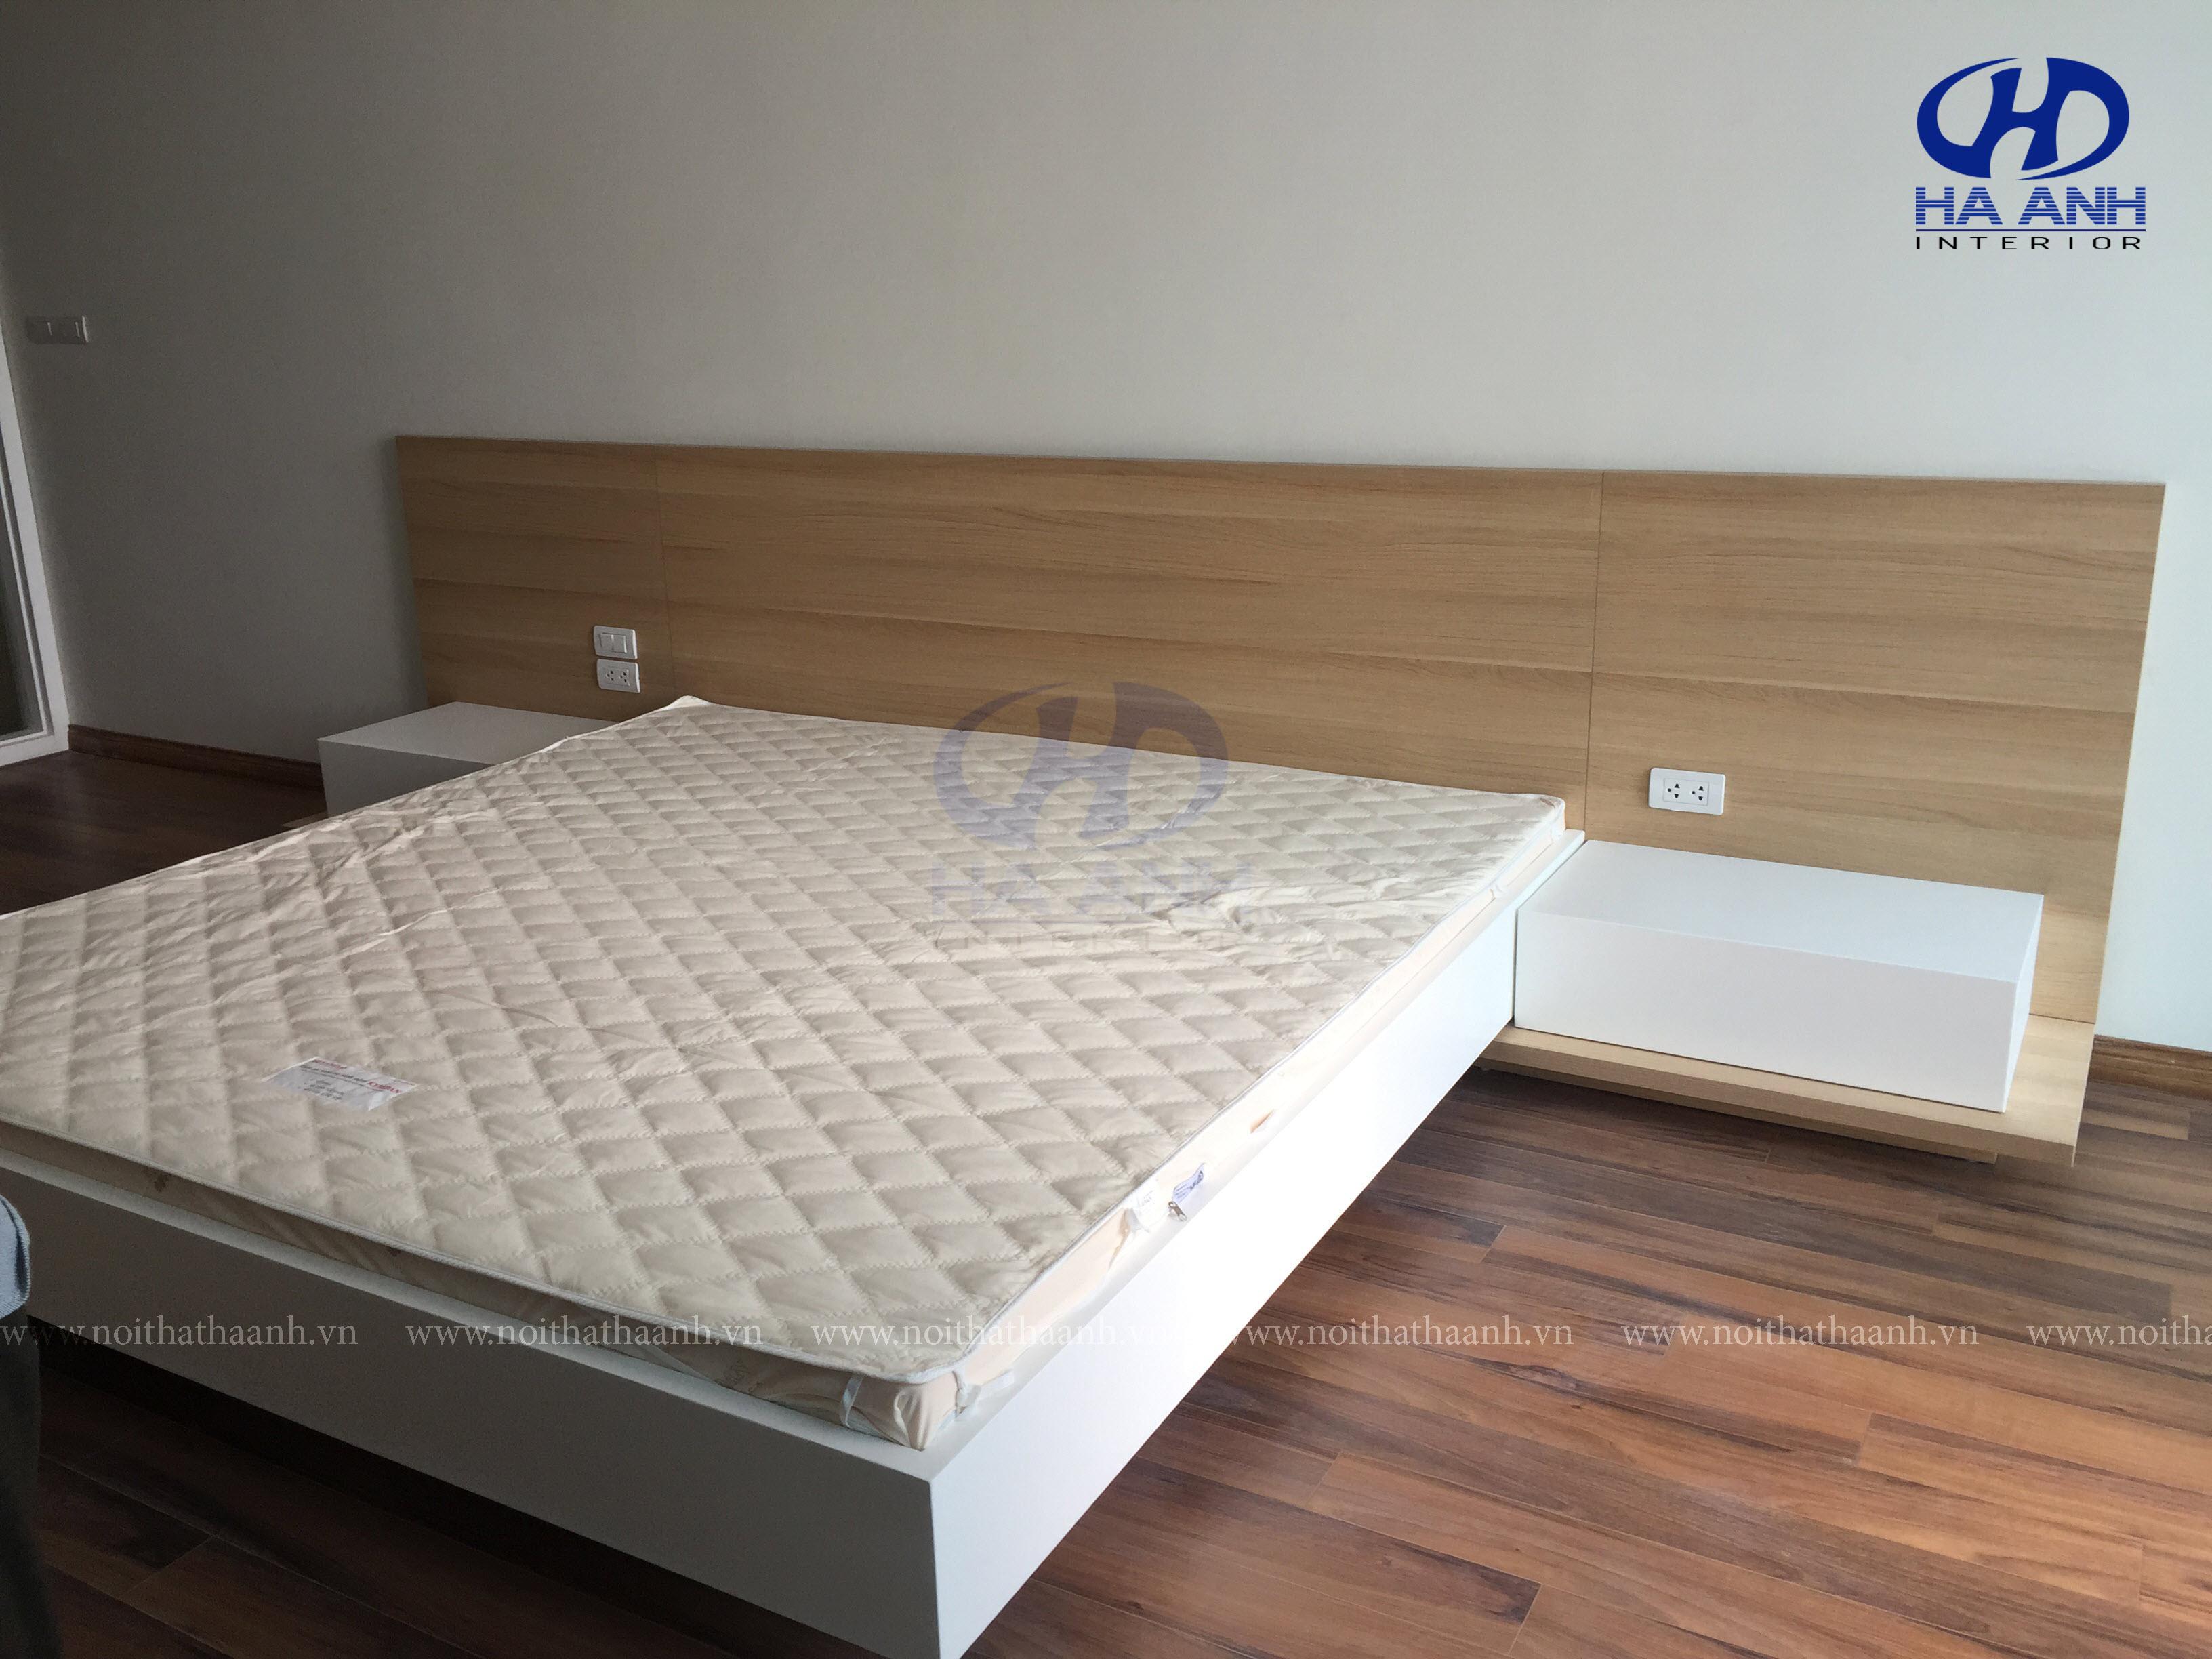 Phòng ngủ laminate HA-8040